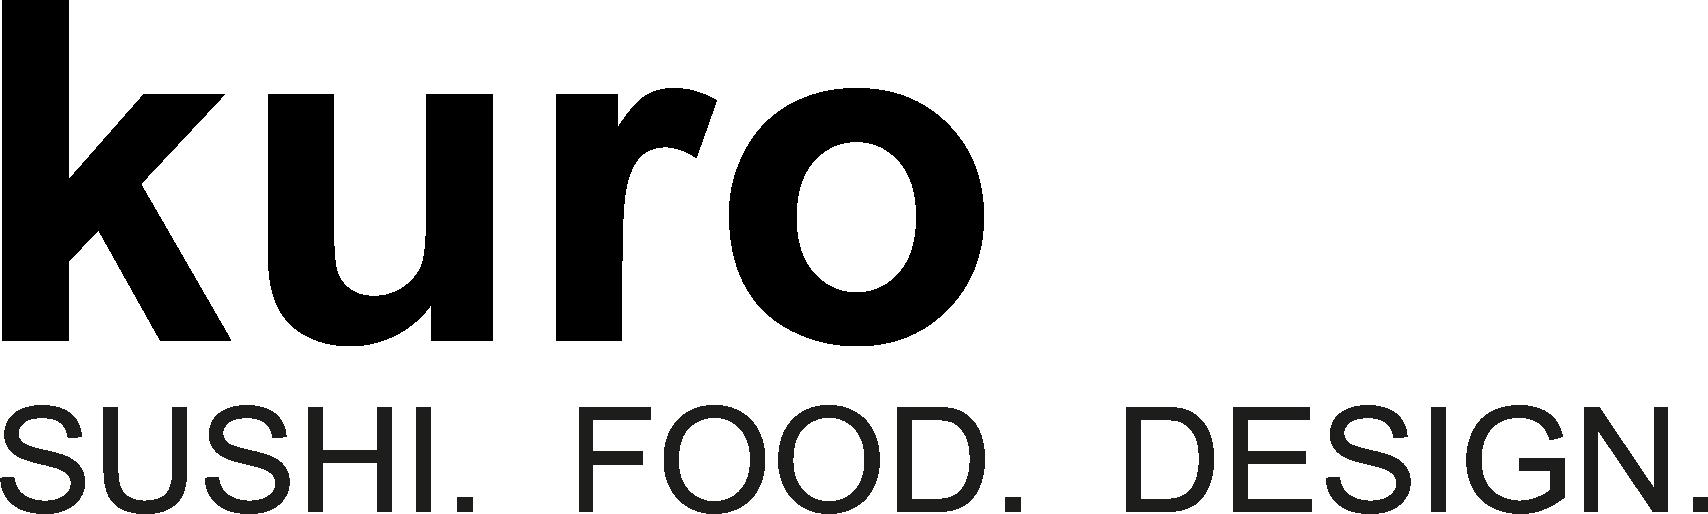 kuro-sushi-ravensburg